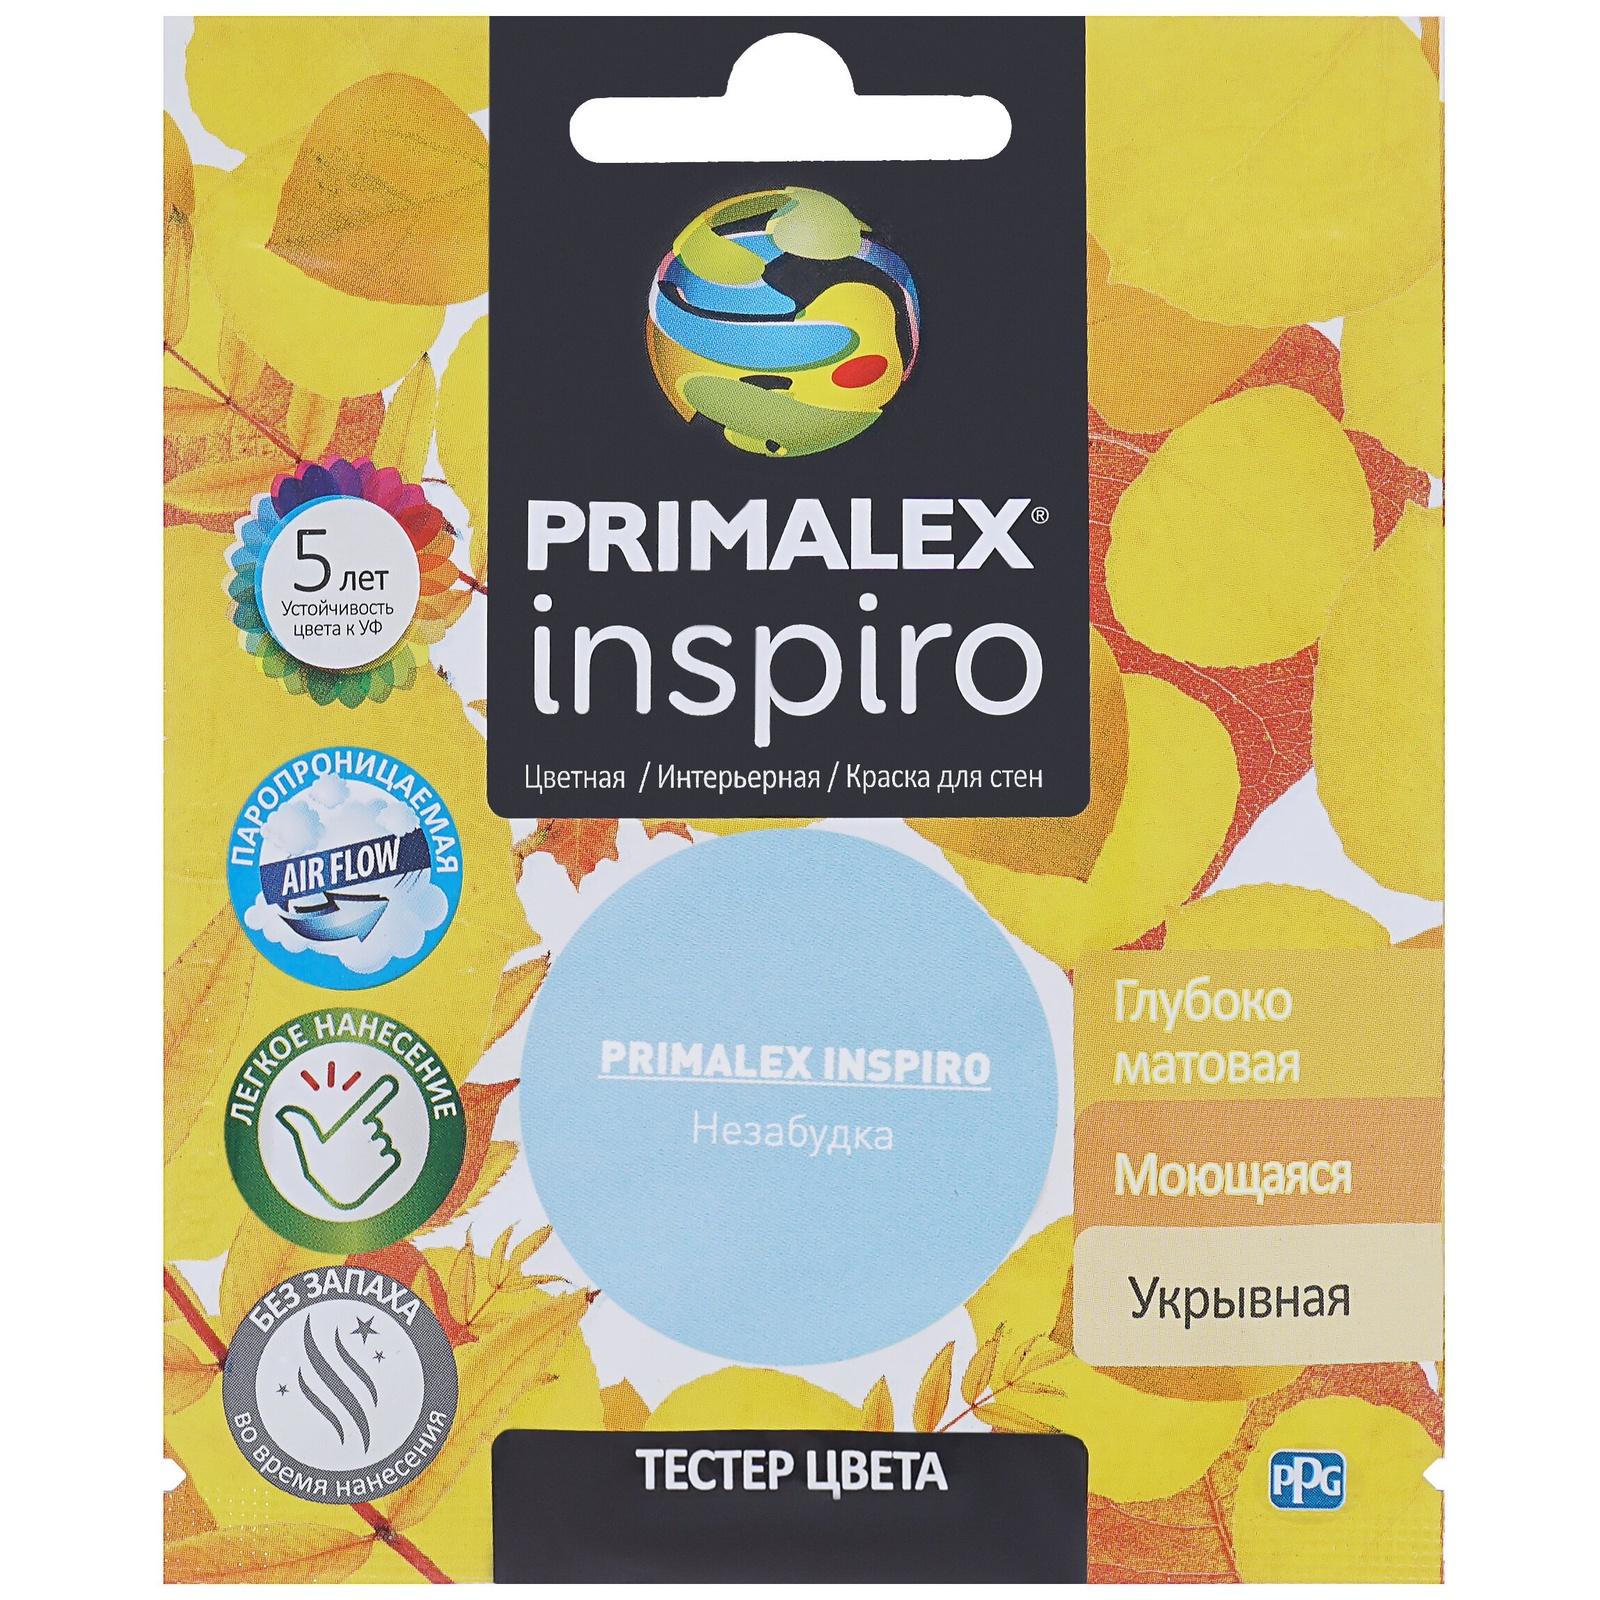 Краска PPG Primalex Inspiro Незабудка 40мл краска ppg primalex inspiro красный мак 40мл pmx i47